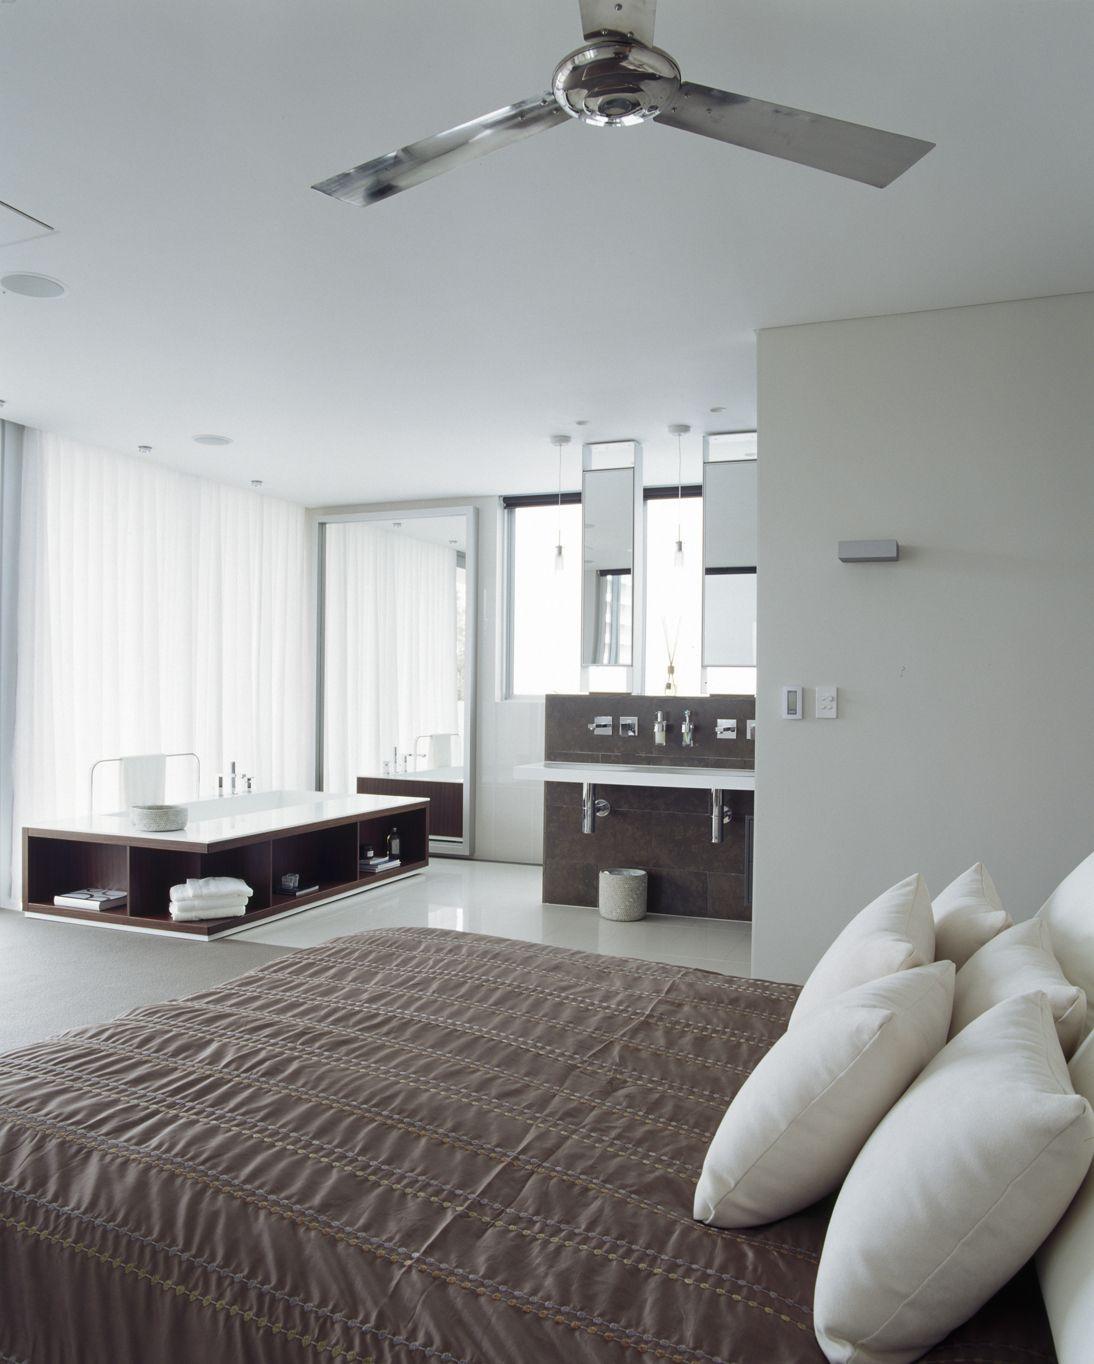 Open Concept Bedroom And Bathroom Ideas New Modern Design